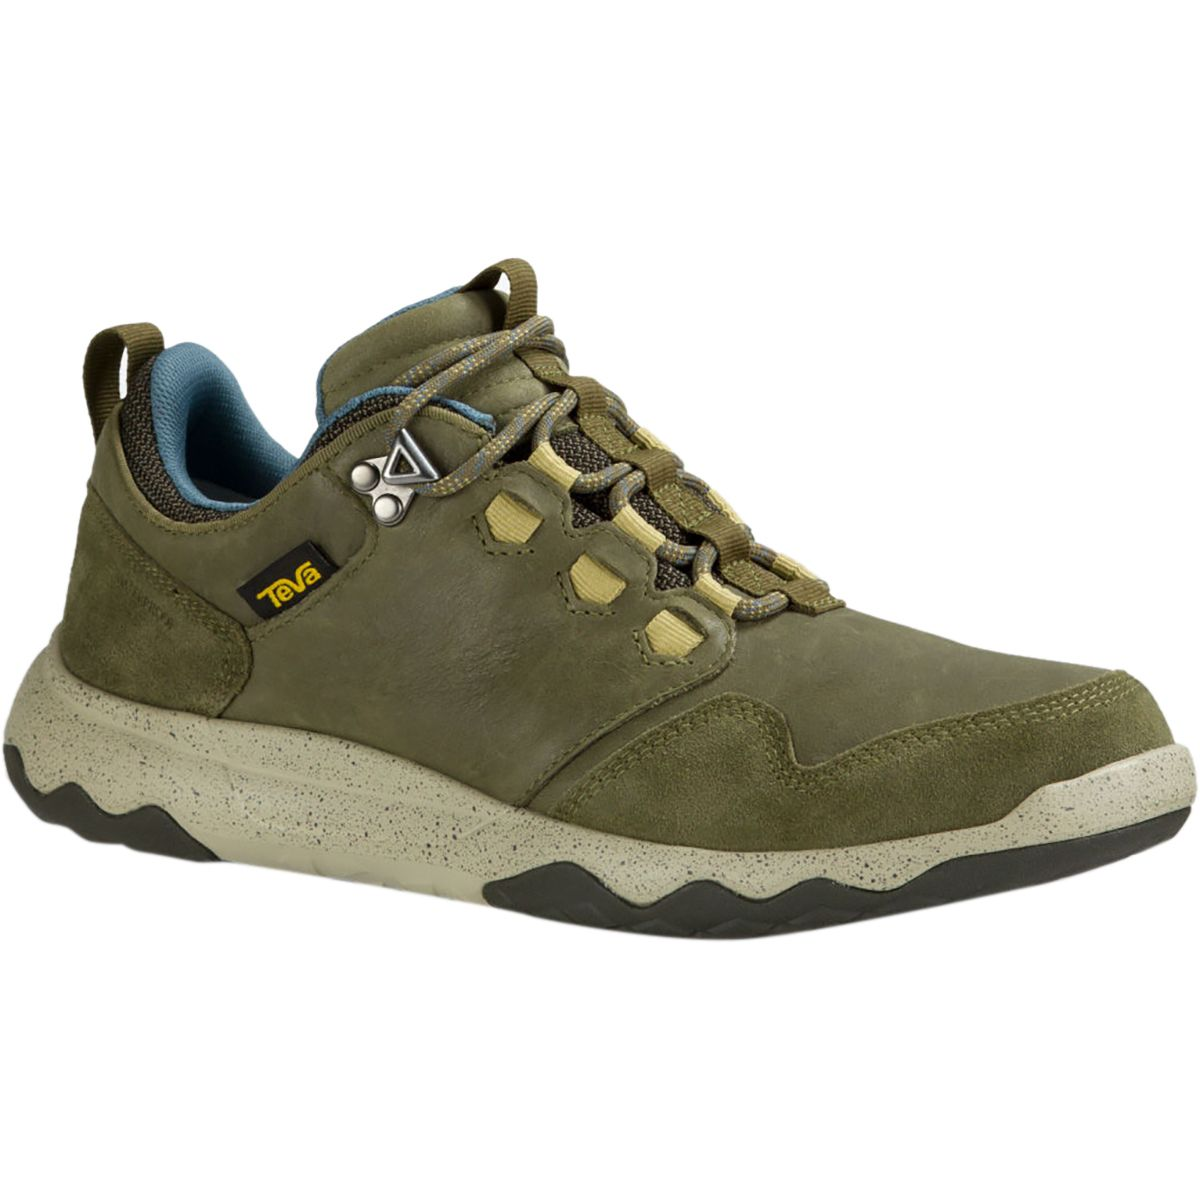 Teva Arrowood Lux Waterproof Shoe - Men's